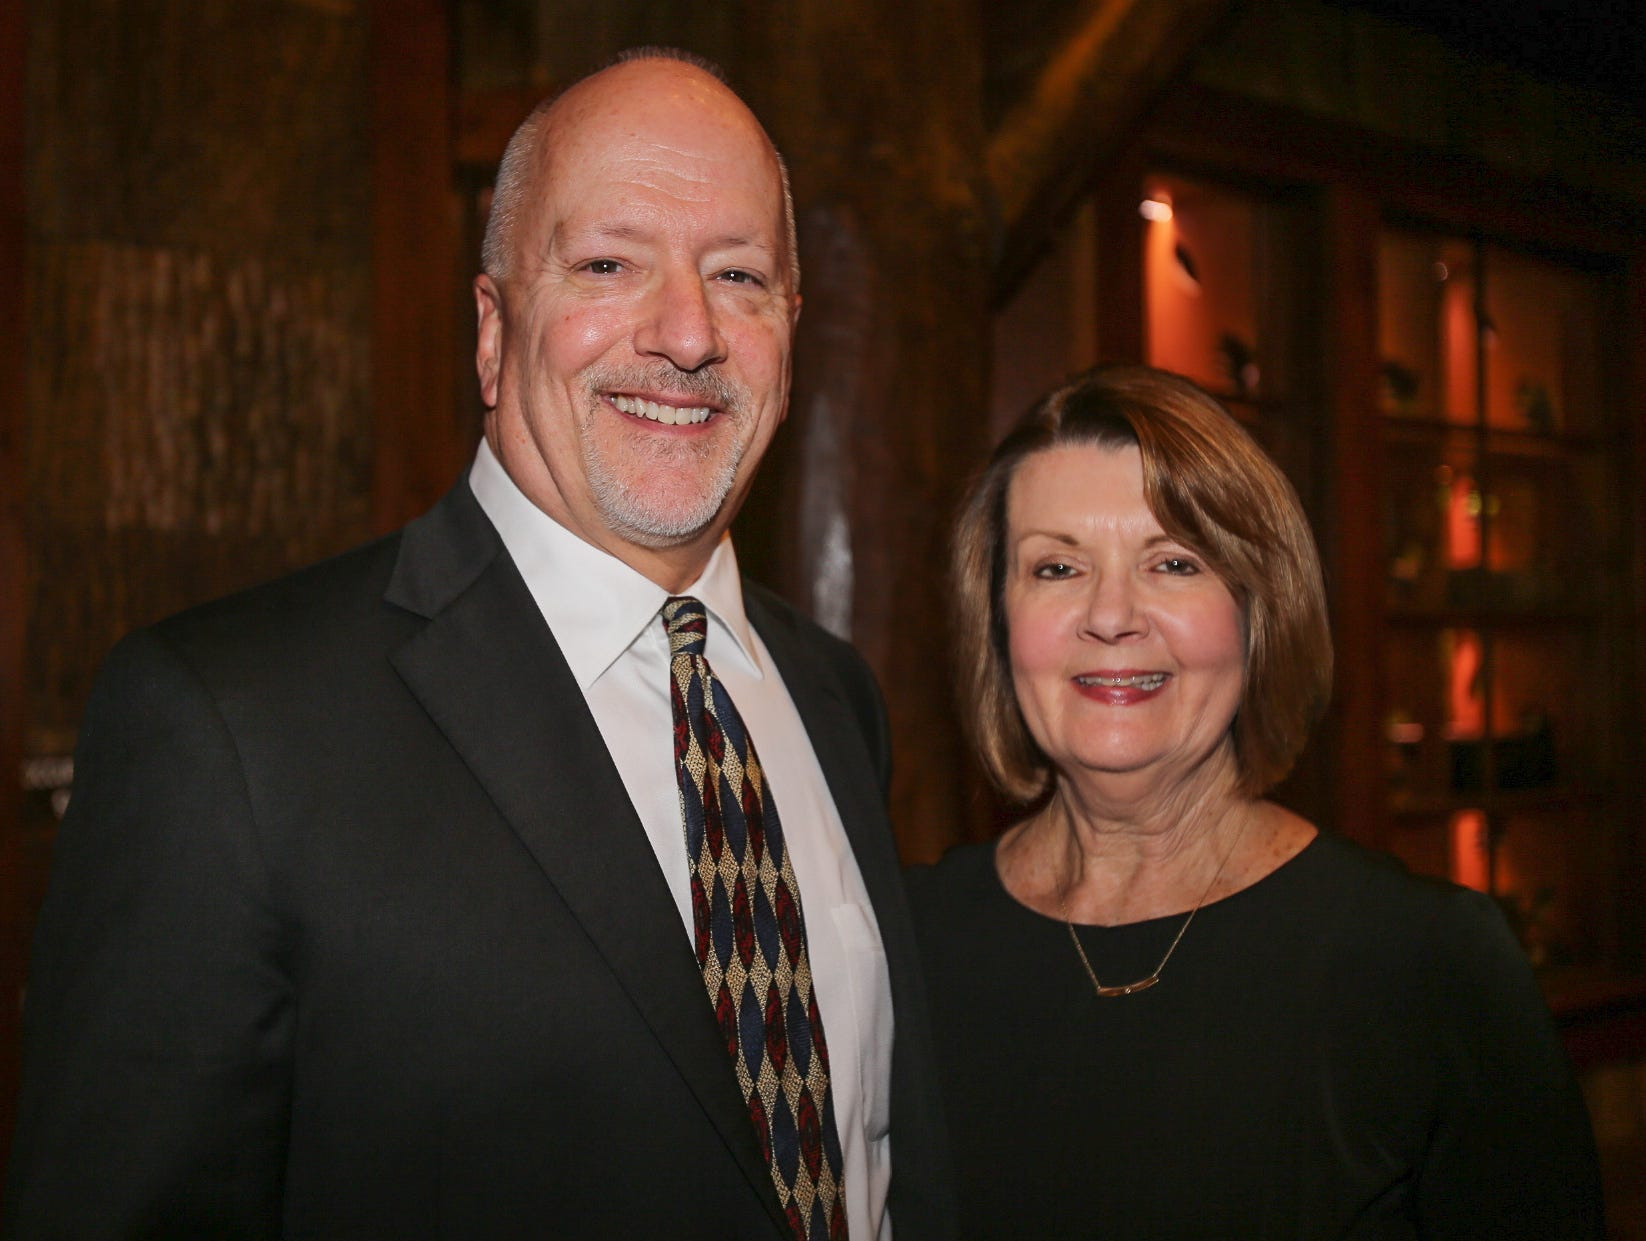 Julian and Brenda Rotramel